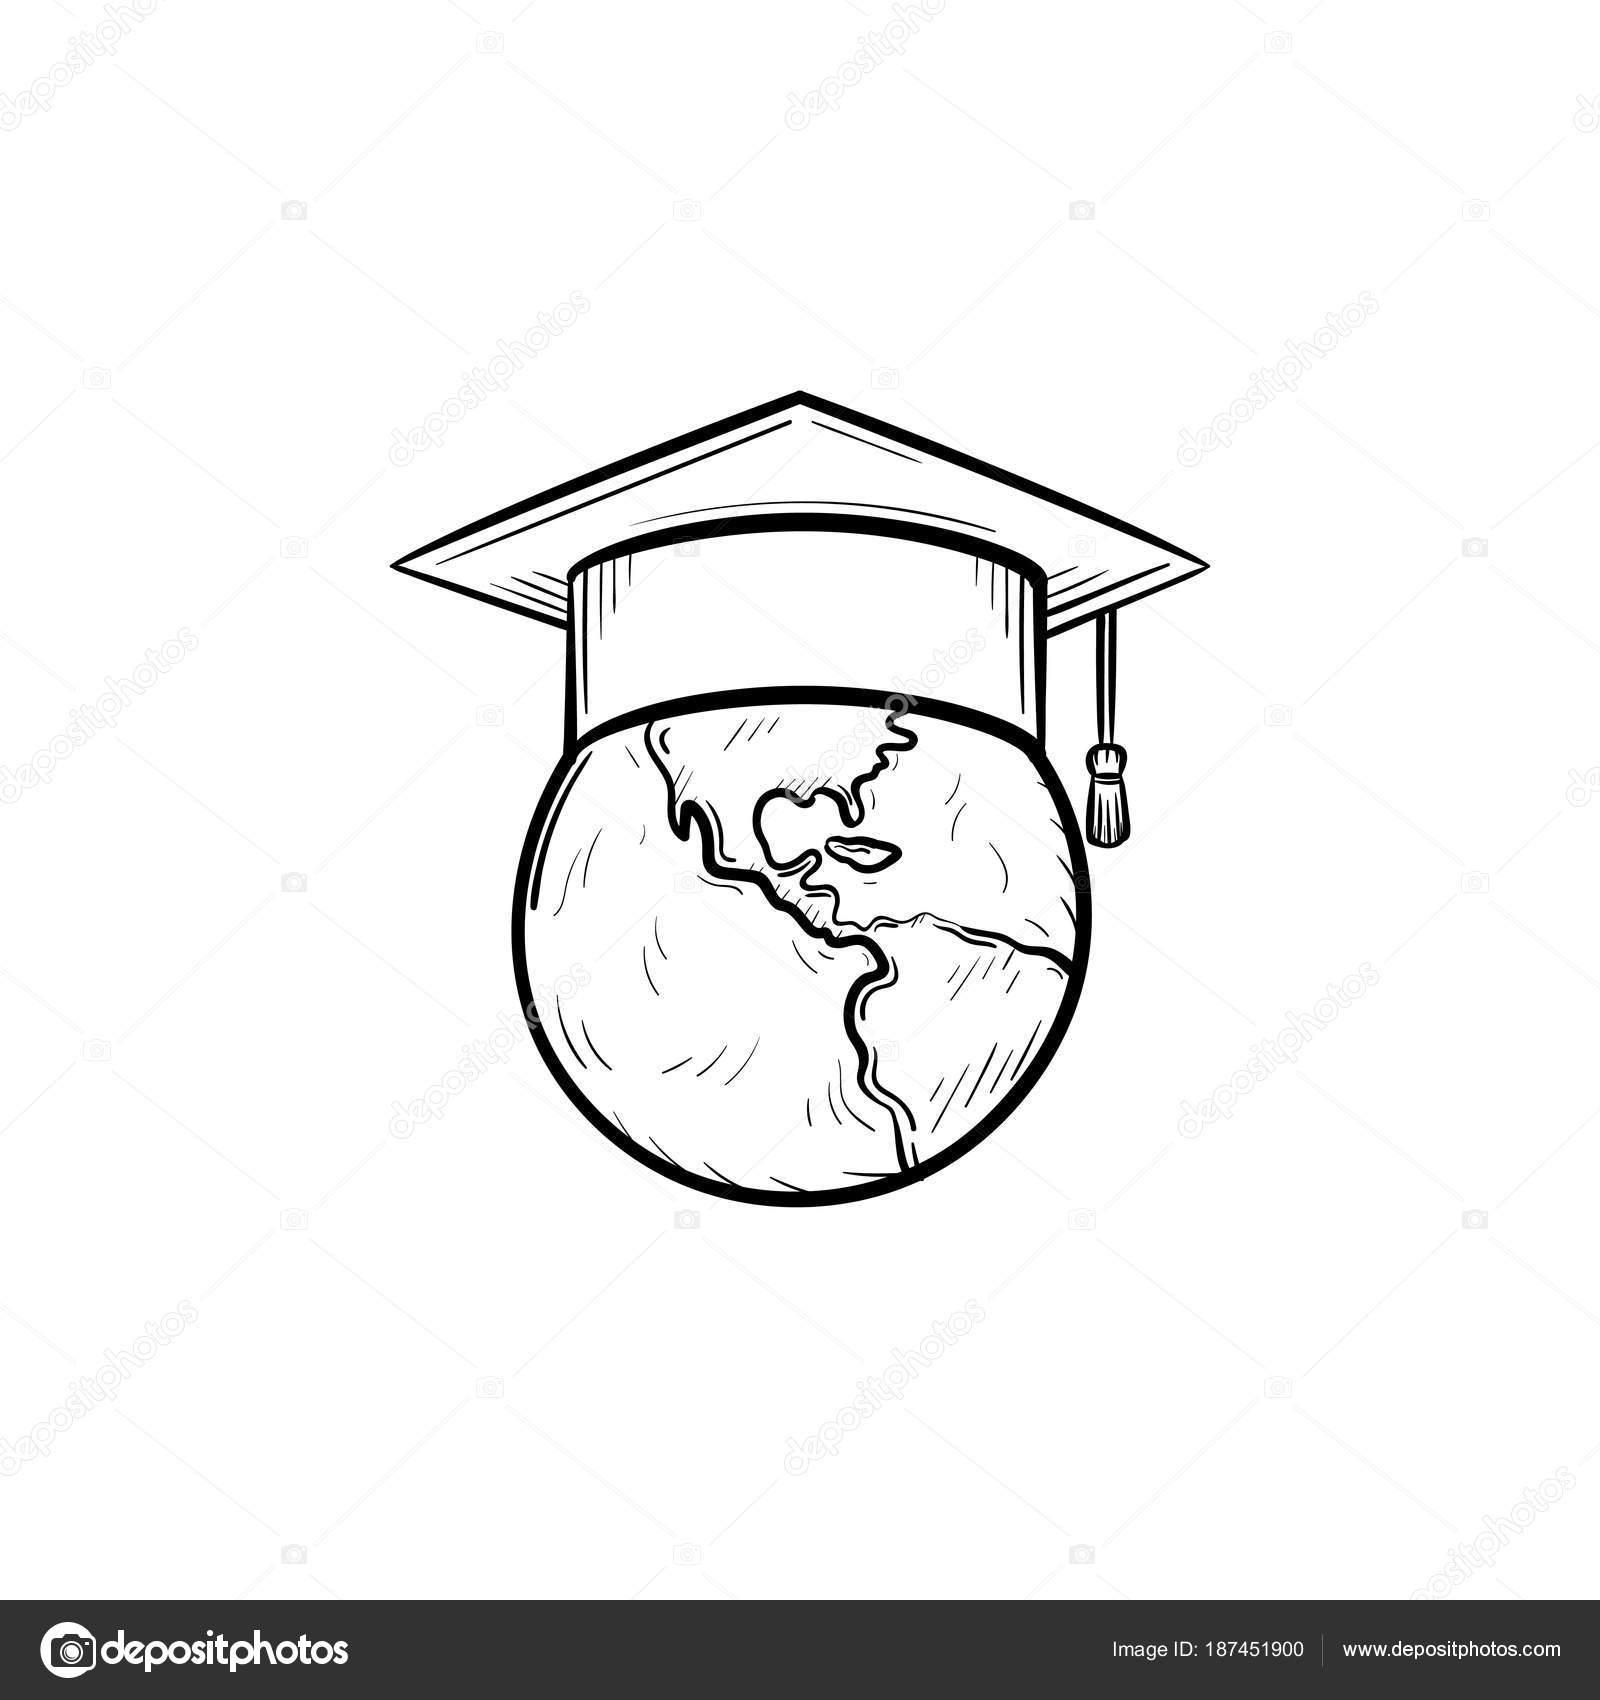 1600x1700 Globe In Graduation Cap Hand Drawn Sketch Icon. Stock Vector